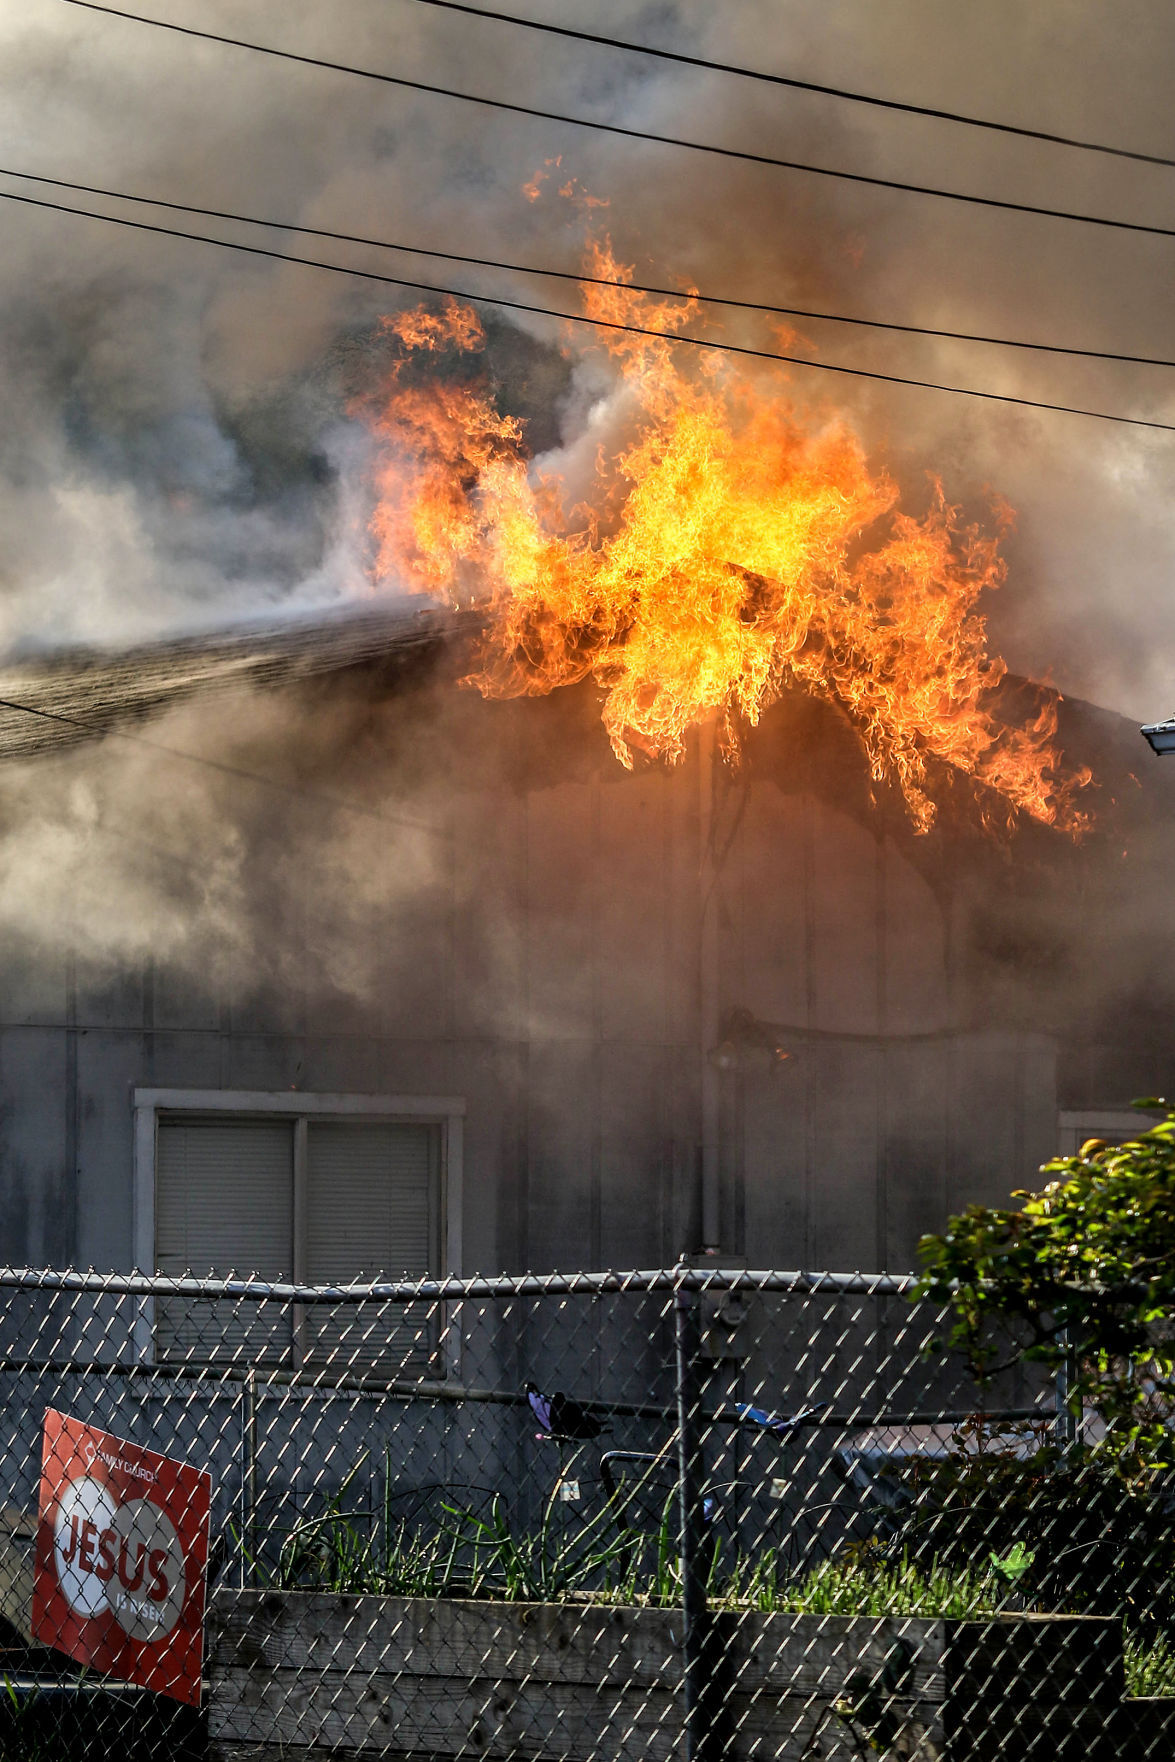 210415-nrr-housefire-05